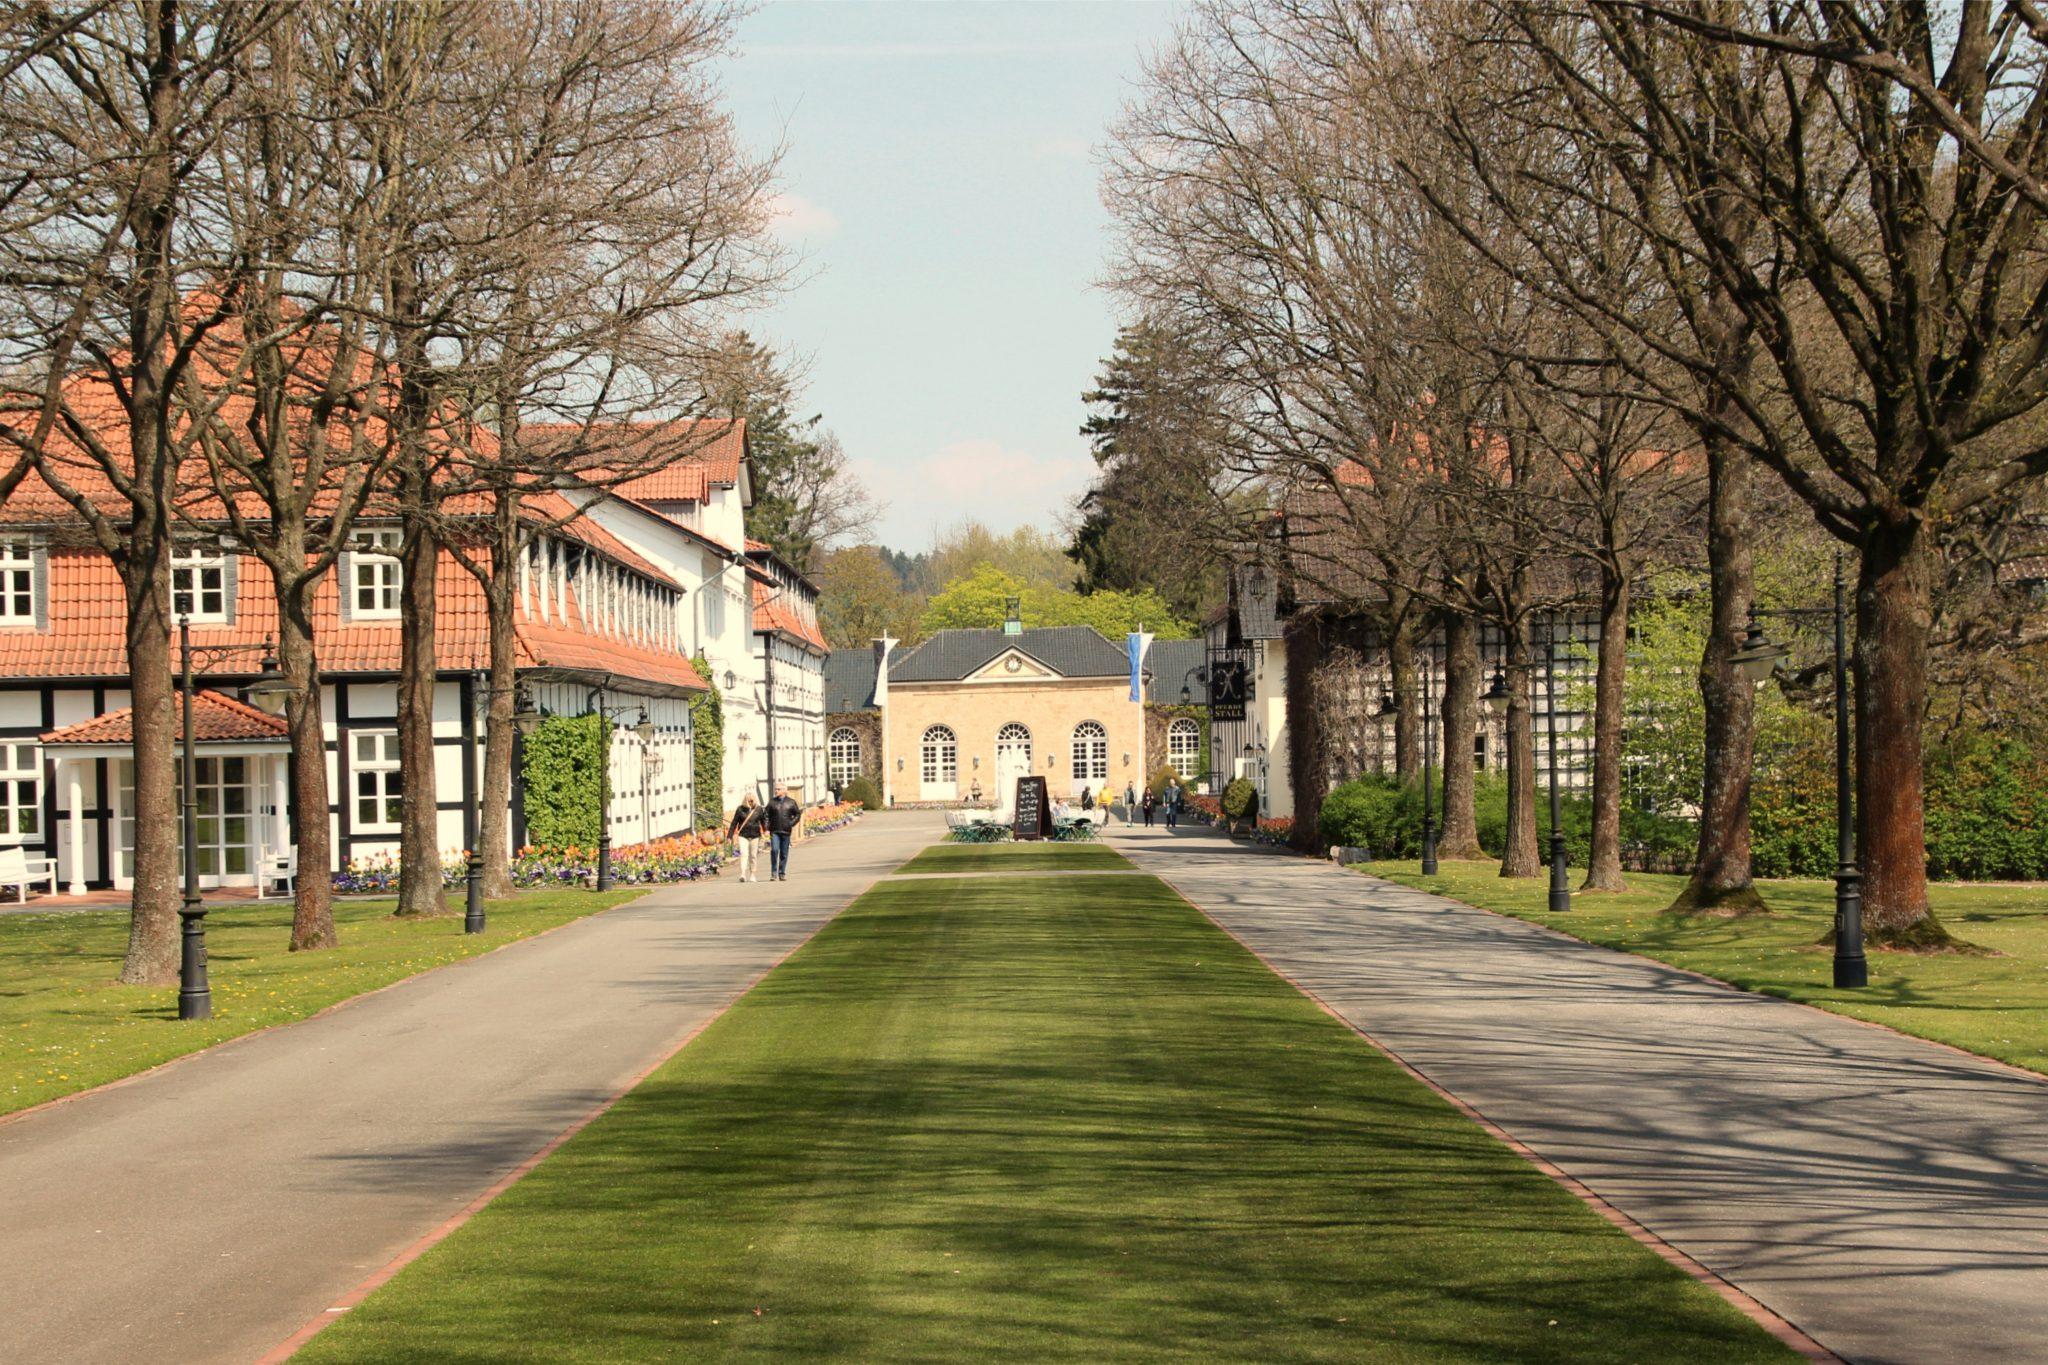 gr flicher park in bad driburg englischer landschaftsgarten in westfalen burgdame. Black Bedroom Furniture Sets. Home Design Ideas